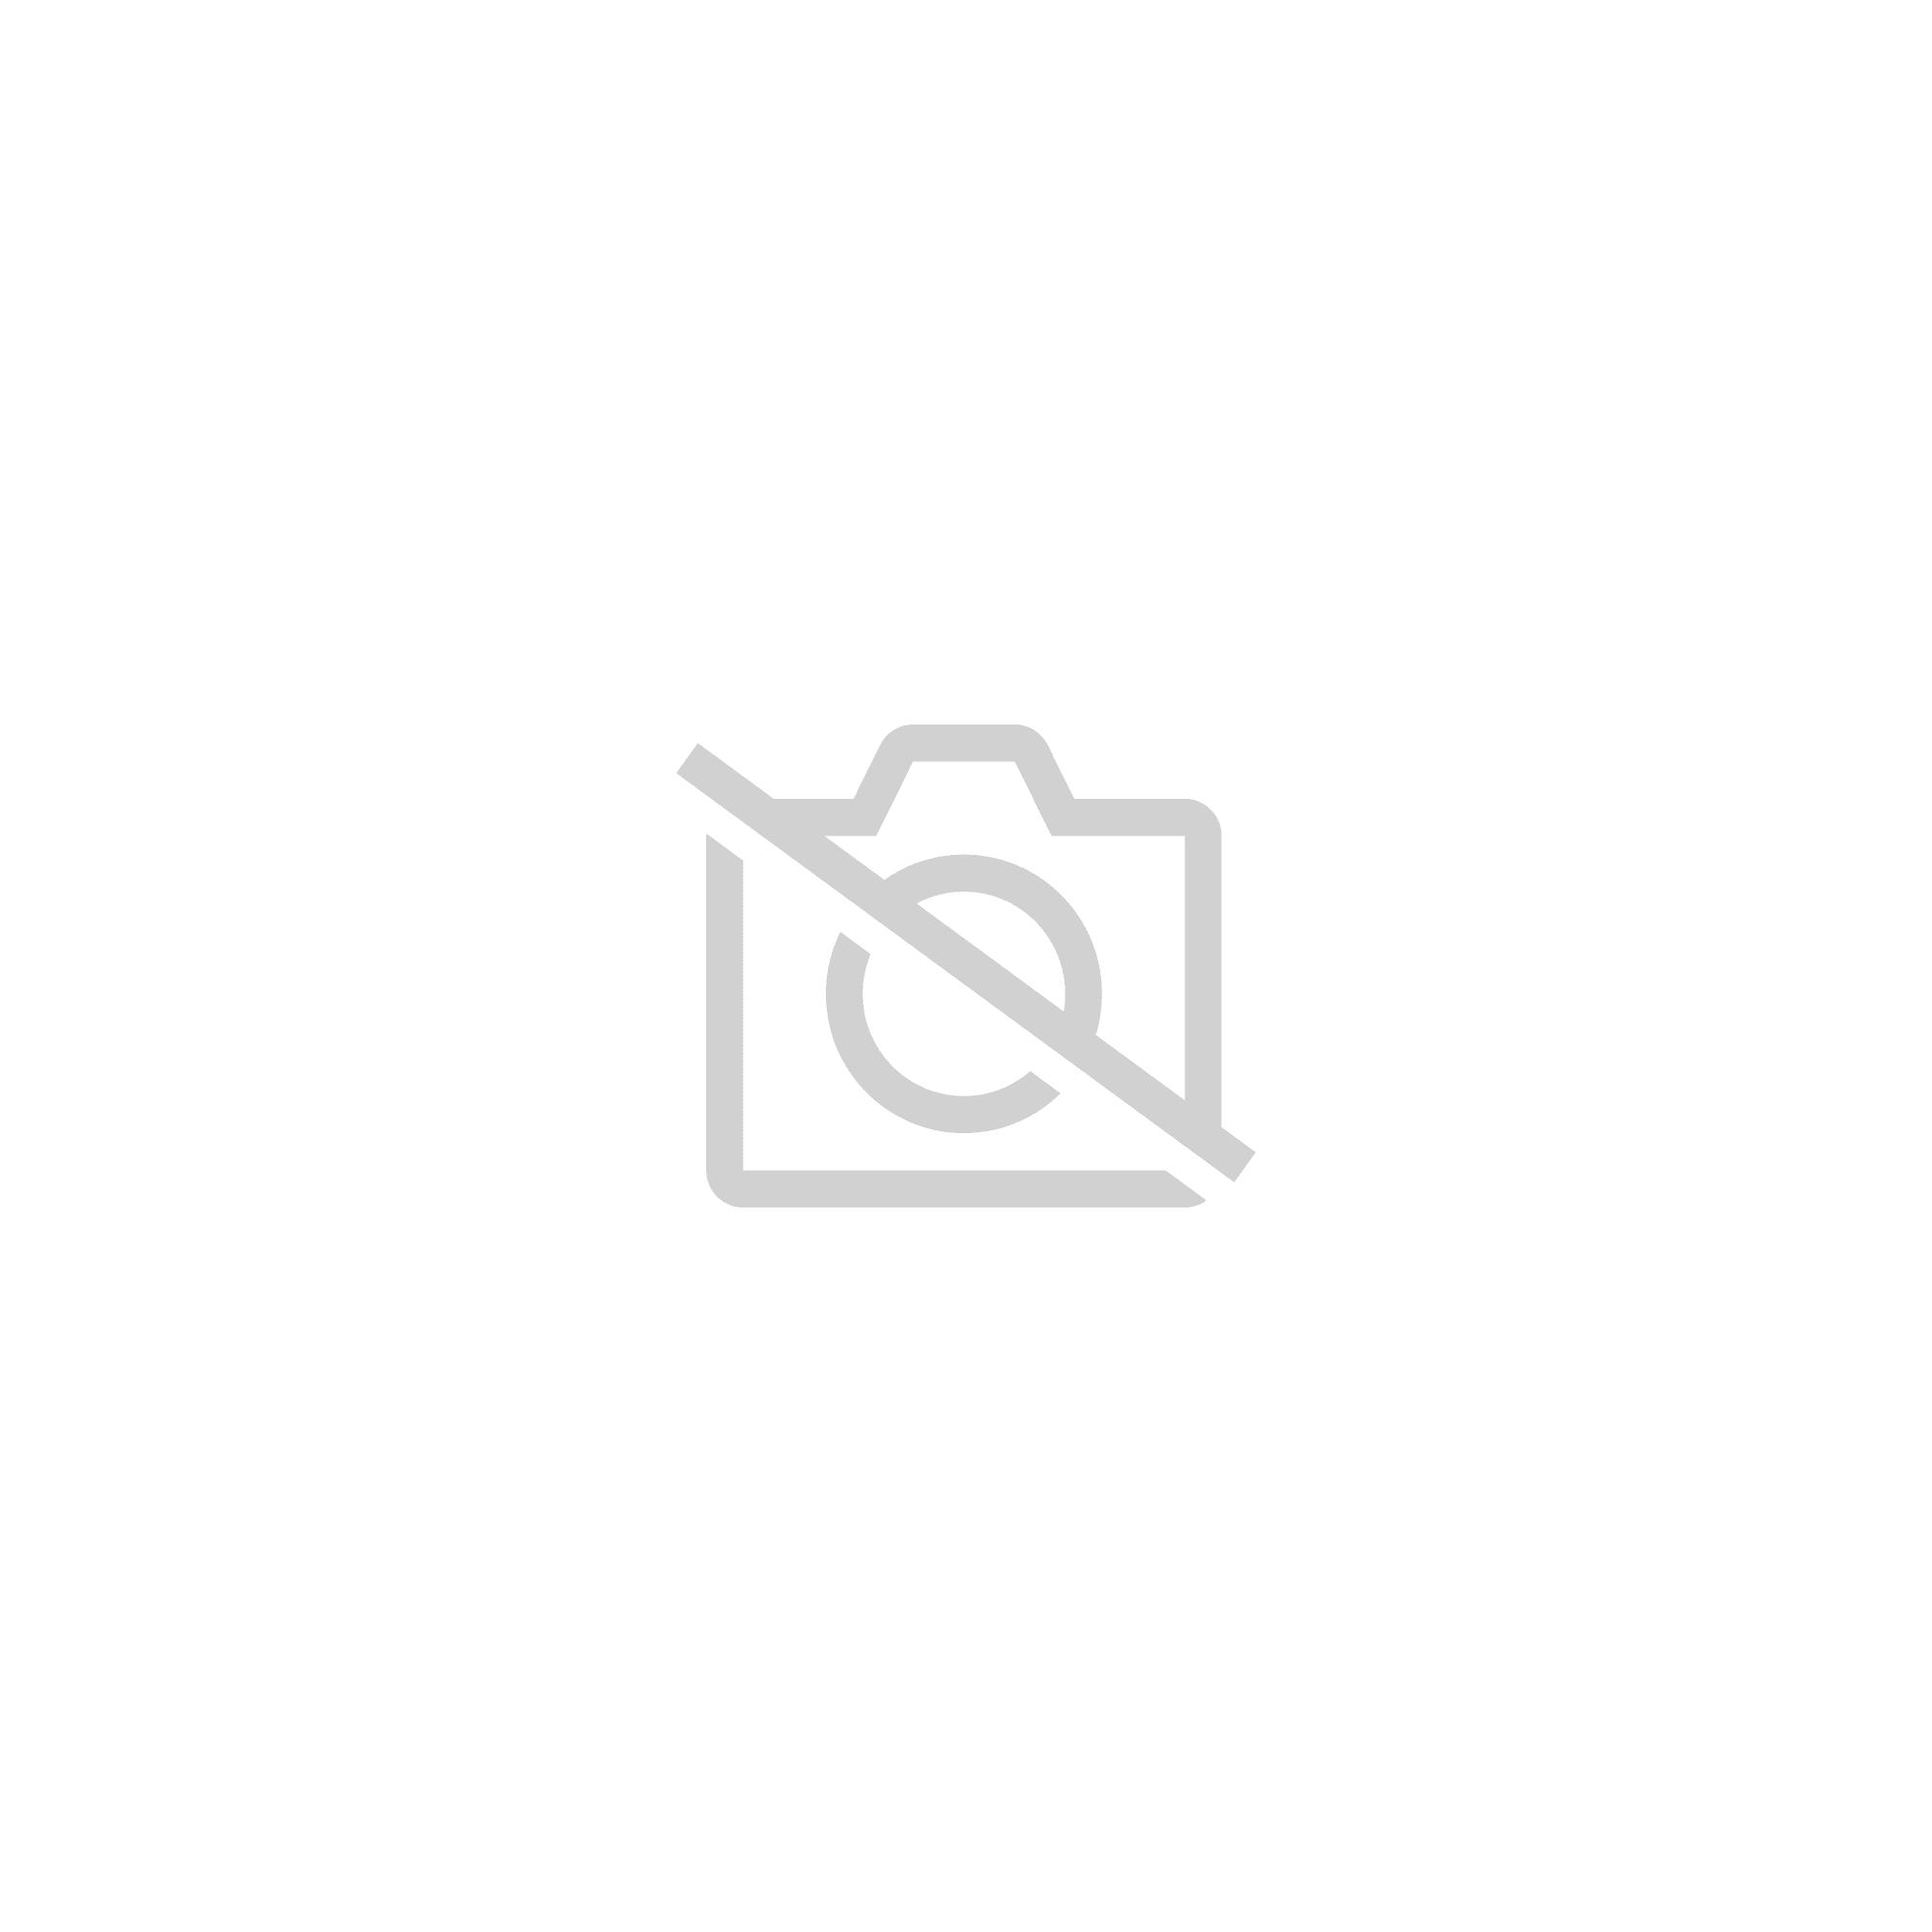 BANDES A PART (DVD)